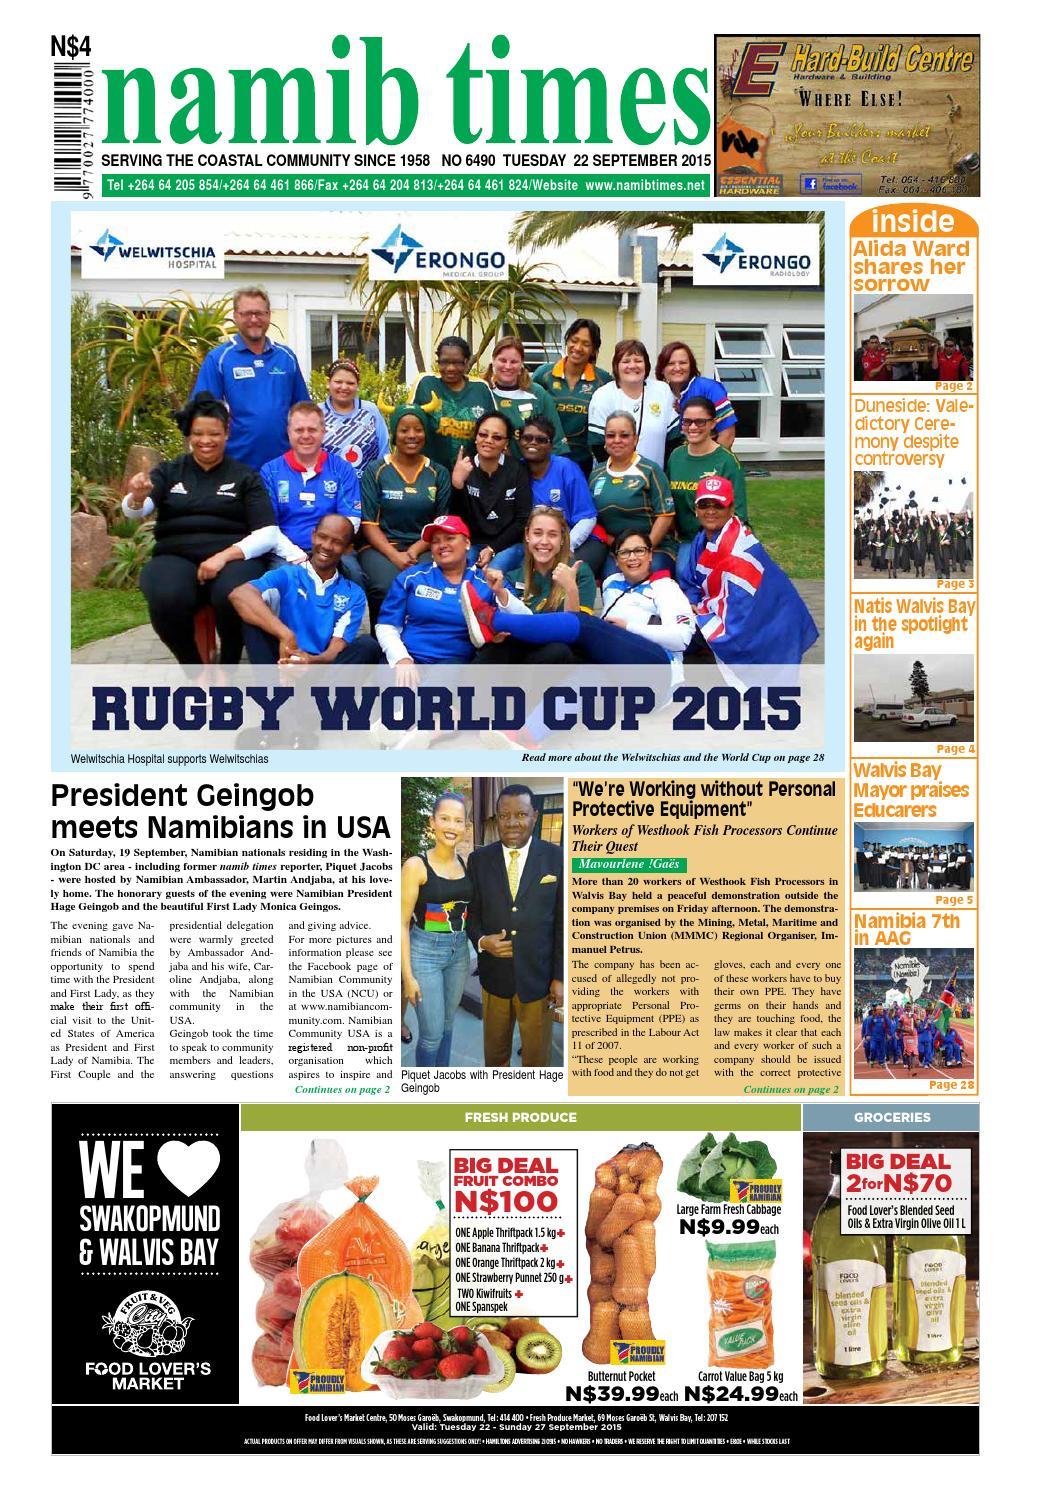 22 september namib times e edition by Namib Times Virtual